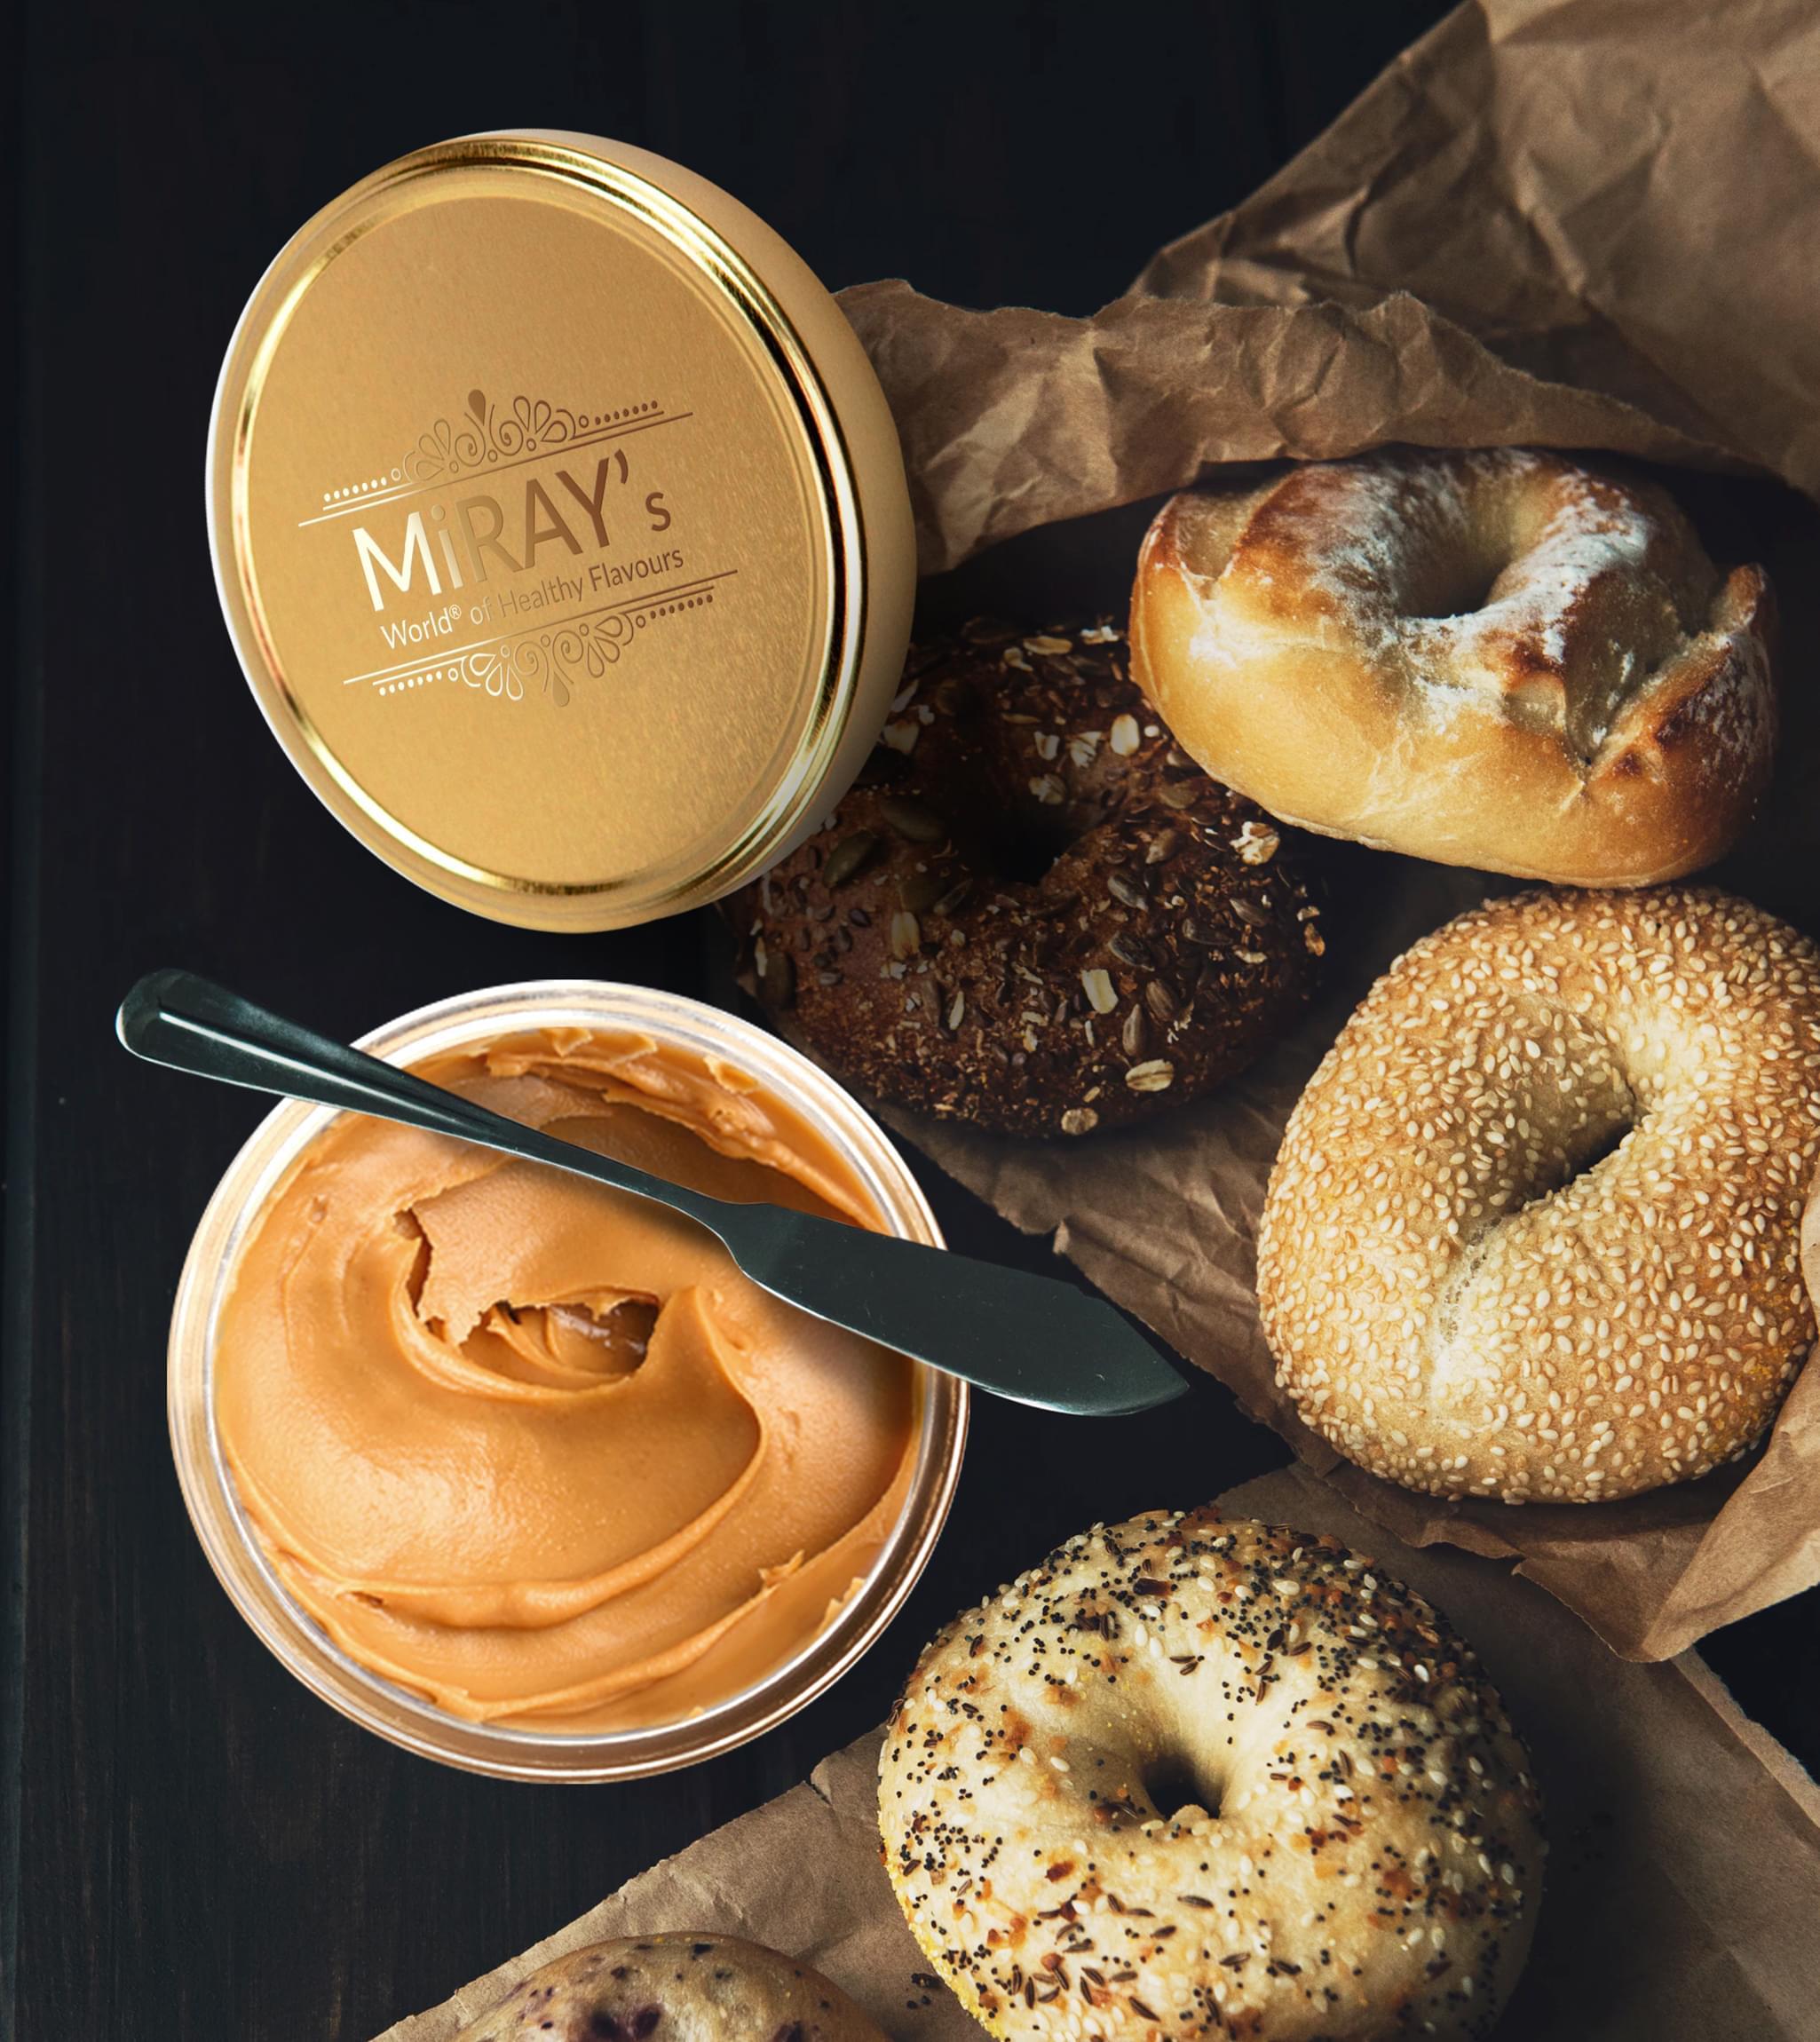 Mirays Packaging